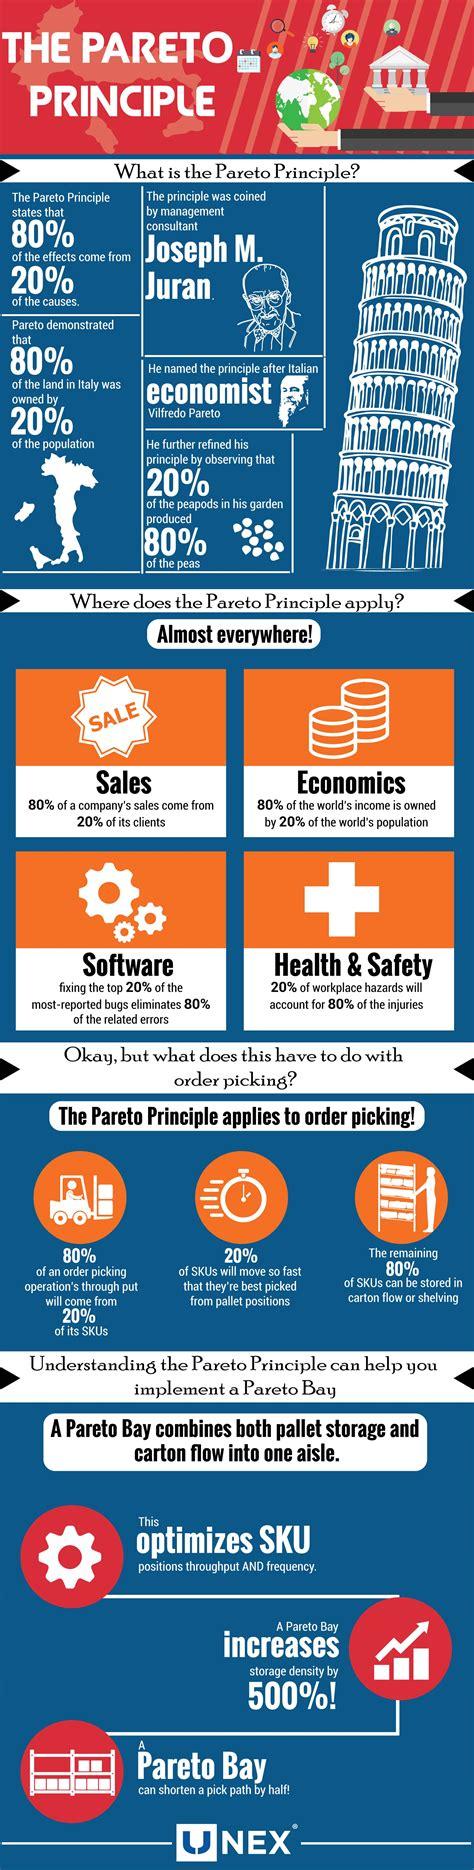 The Pareto Principle Explained [Infographic]